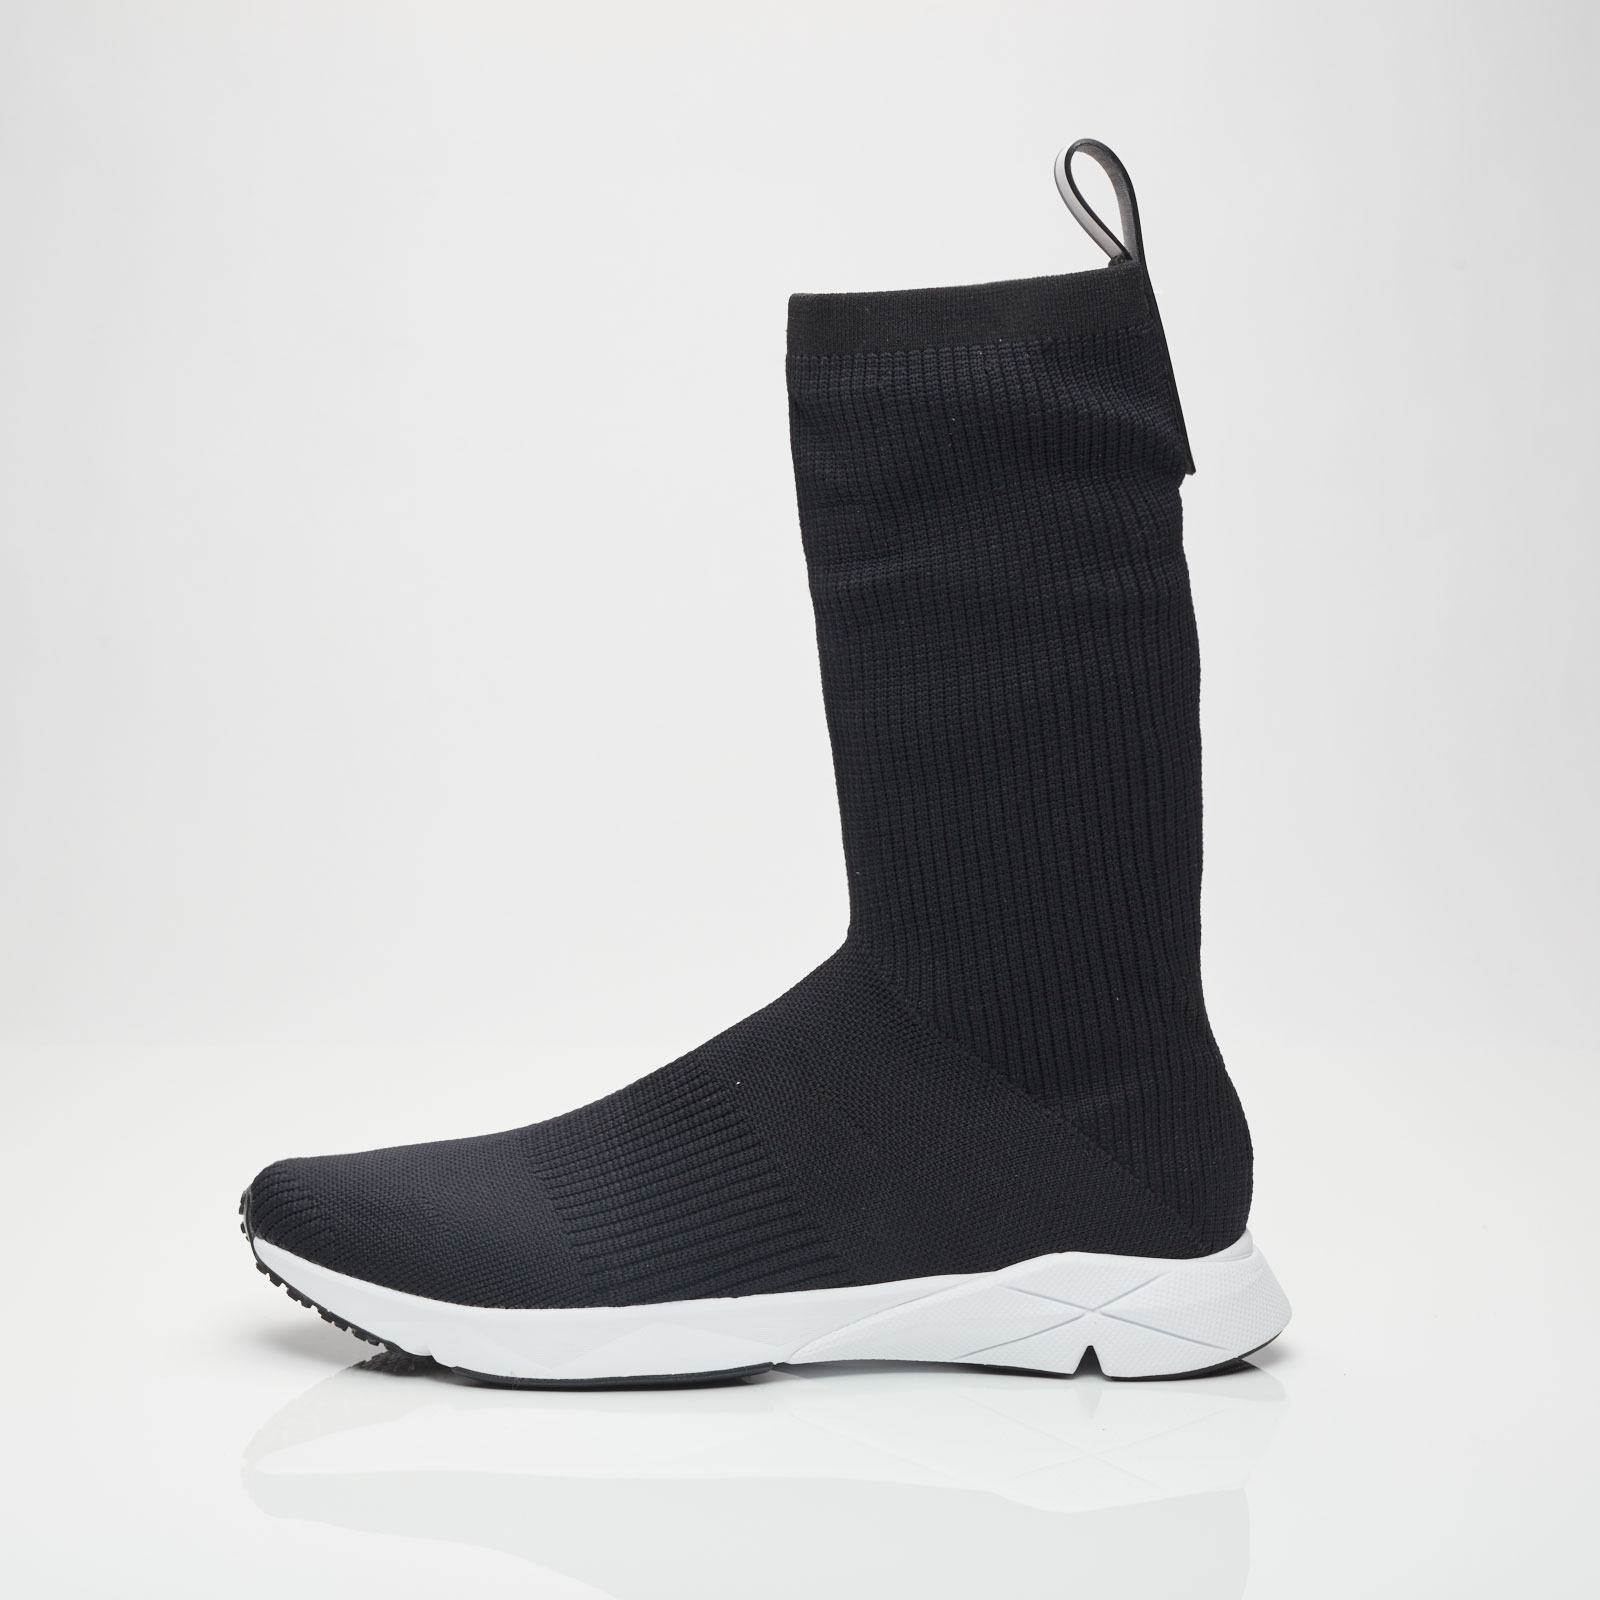 Reebok Sock Supreme ULTK - Bs9515